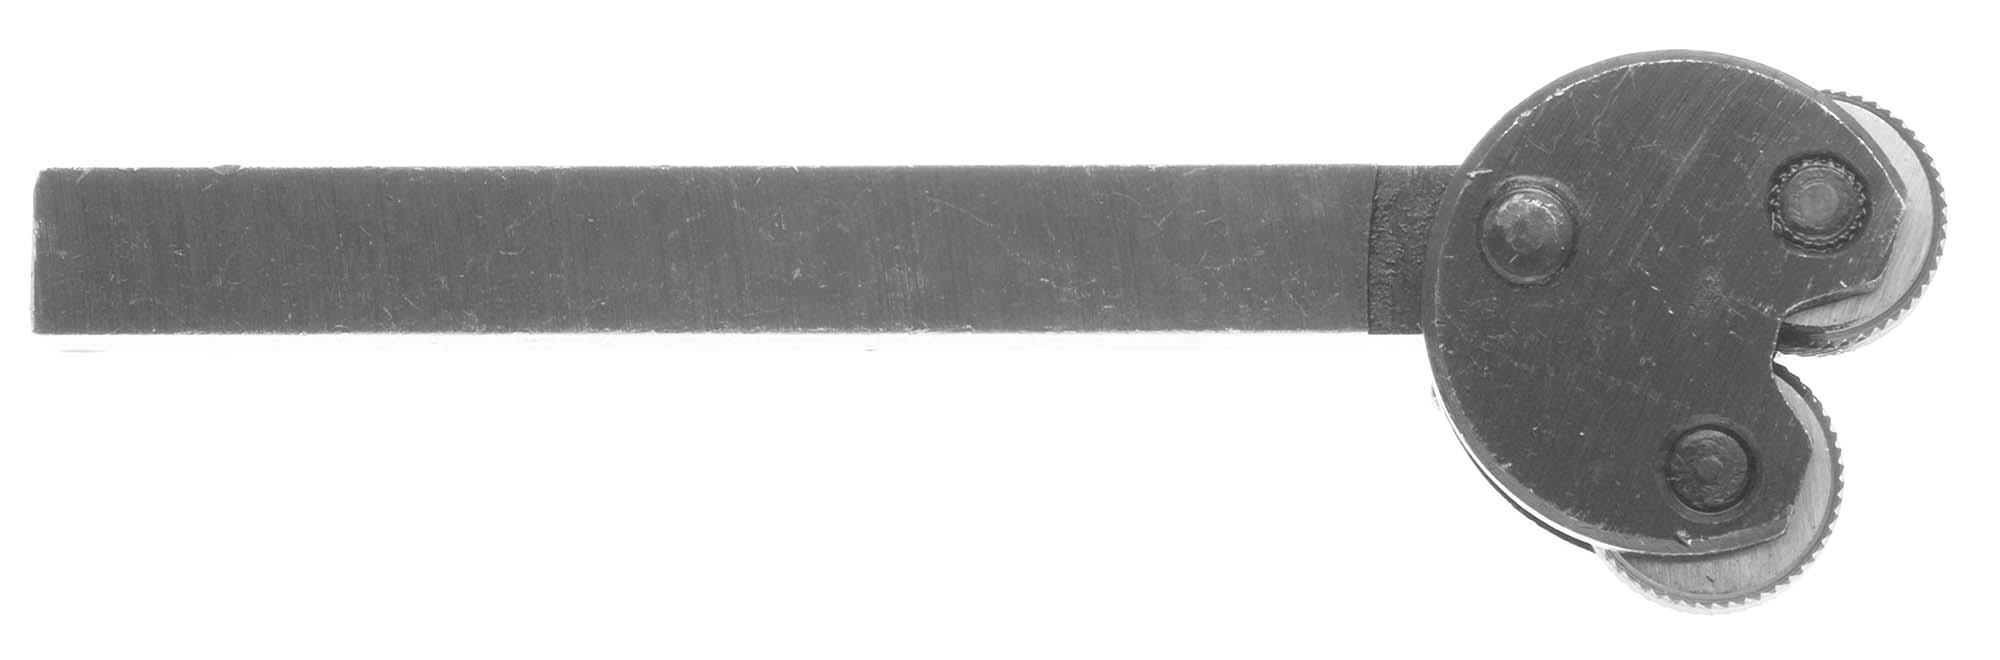 "1/2"" Square Shank Knurl Tool"